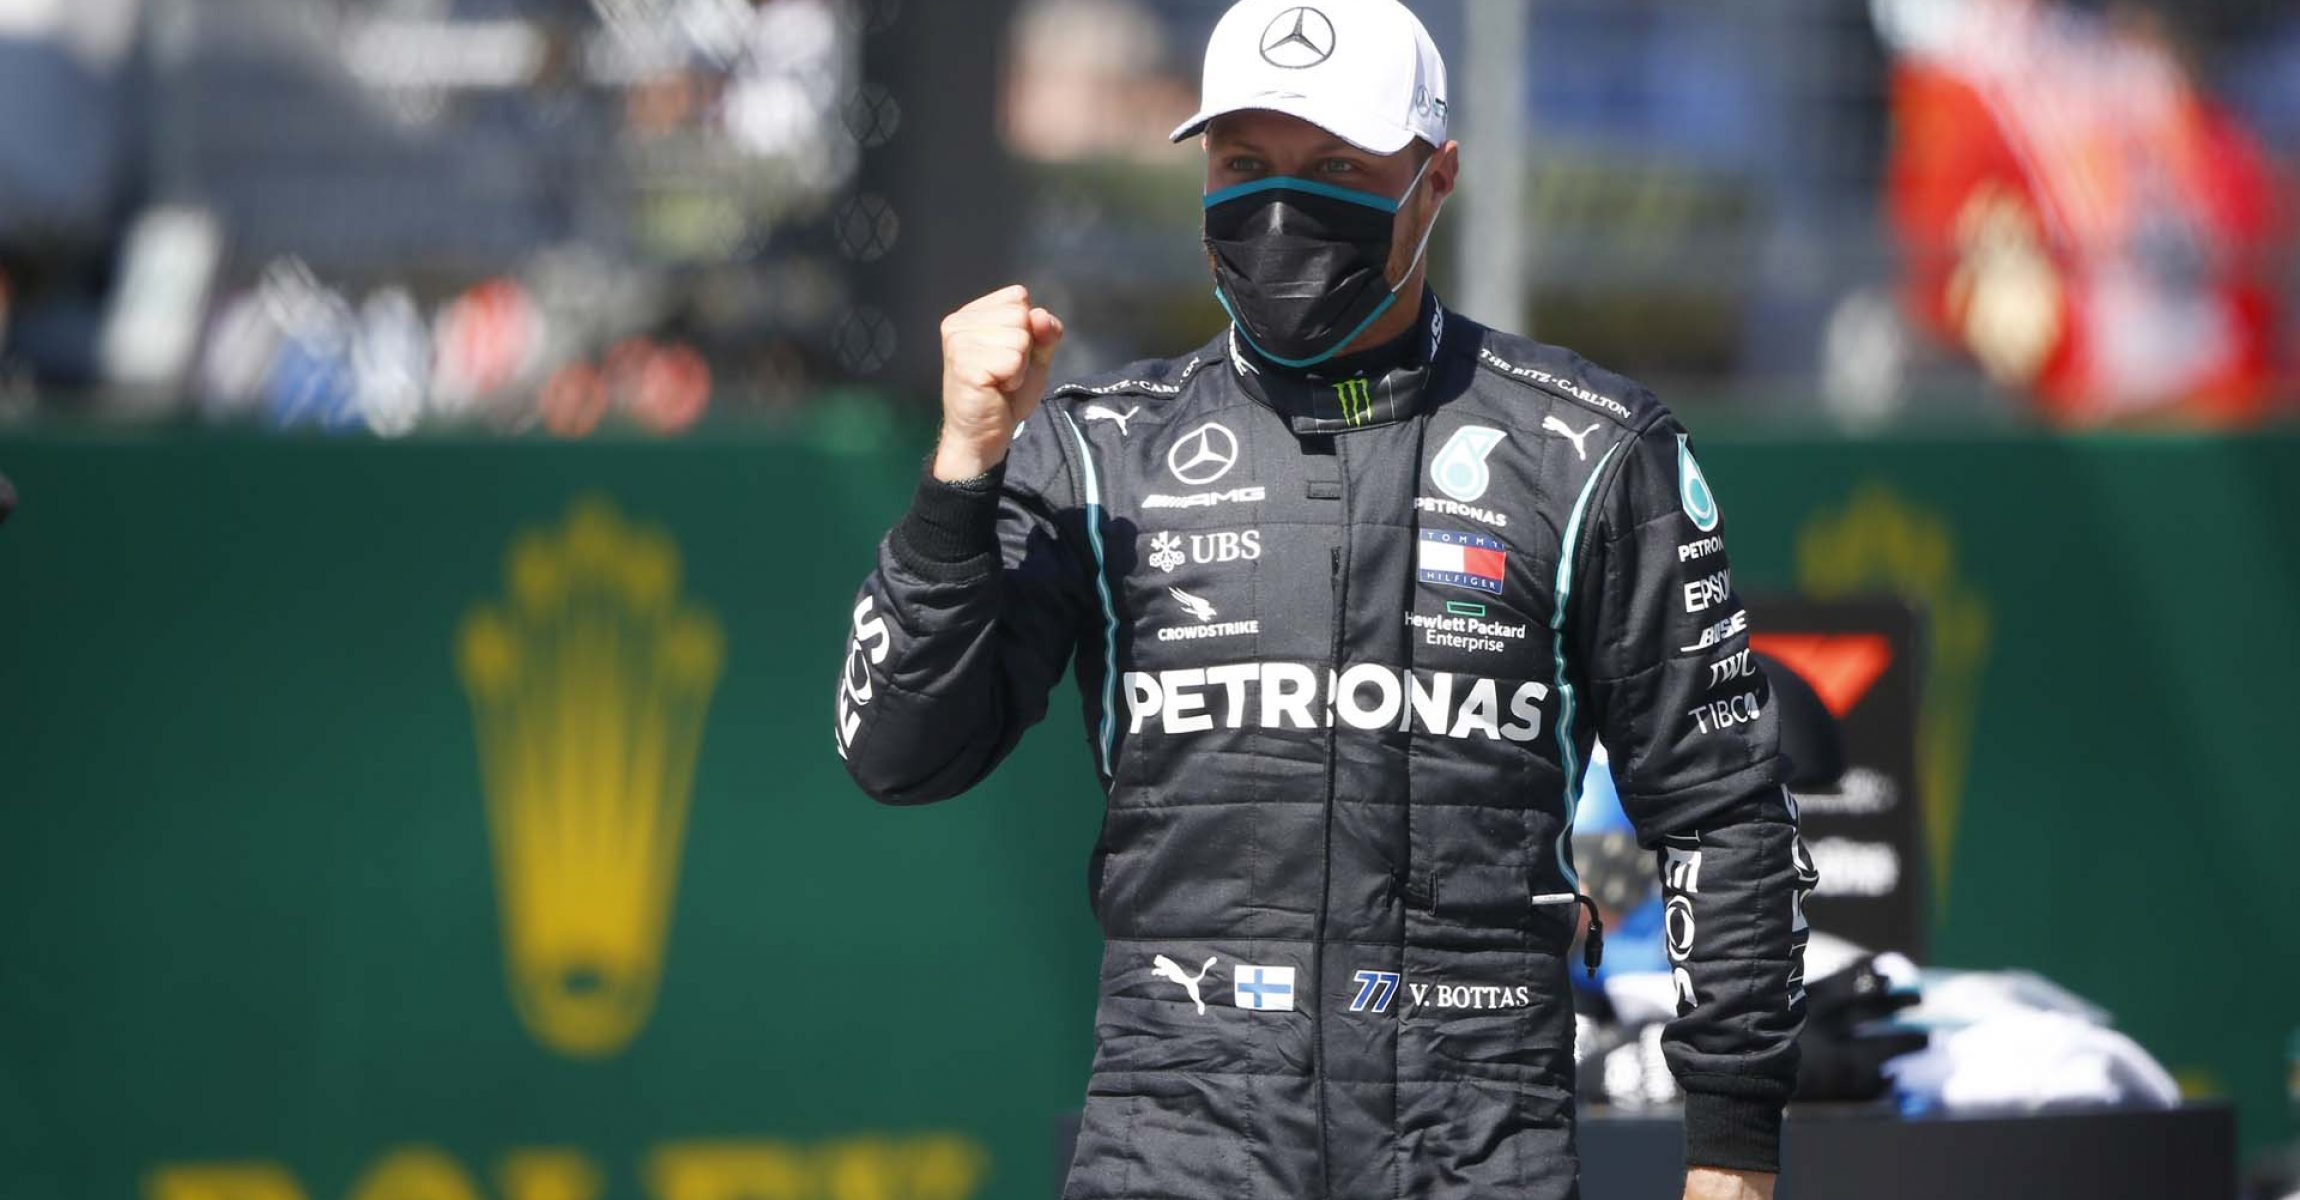 2020 Austrian Grand Prix, Saturday - LAT Images Valtteri Bottas Mercedes